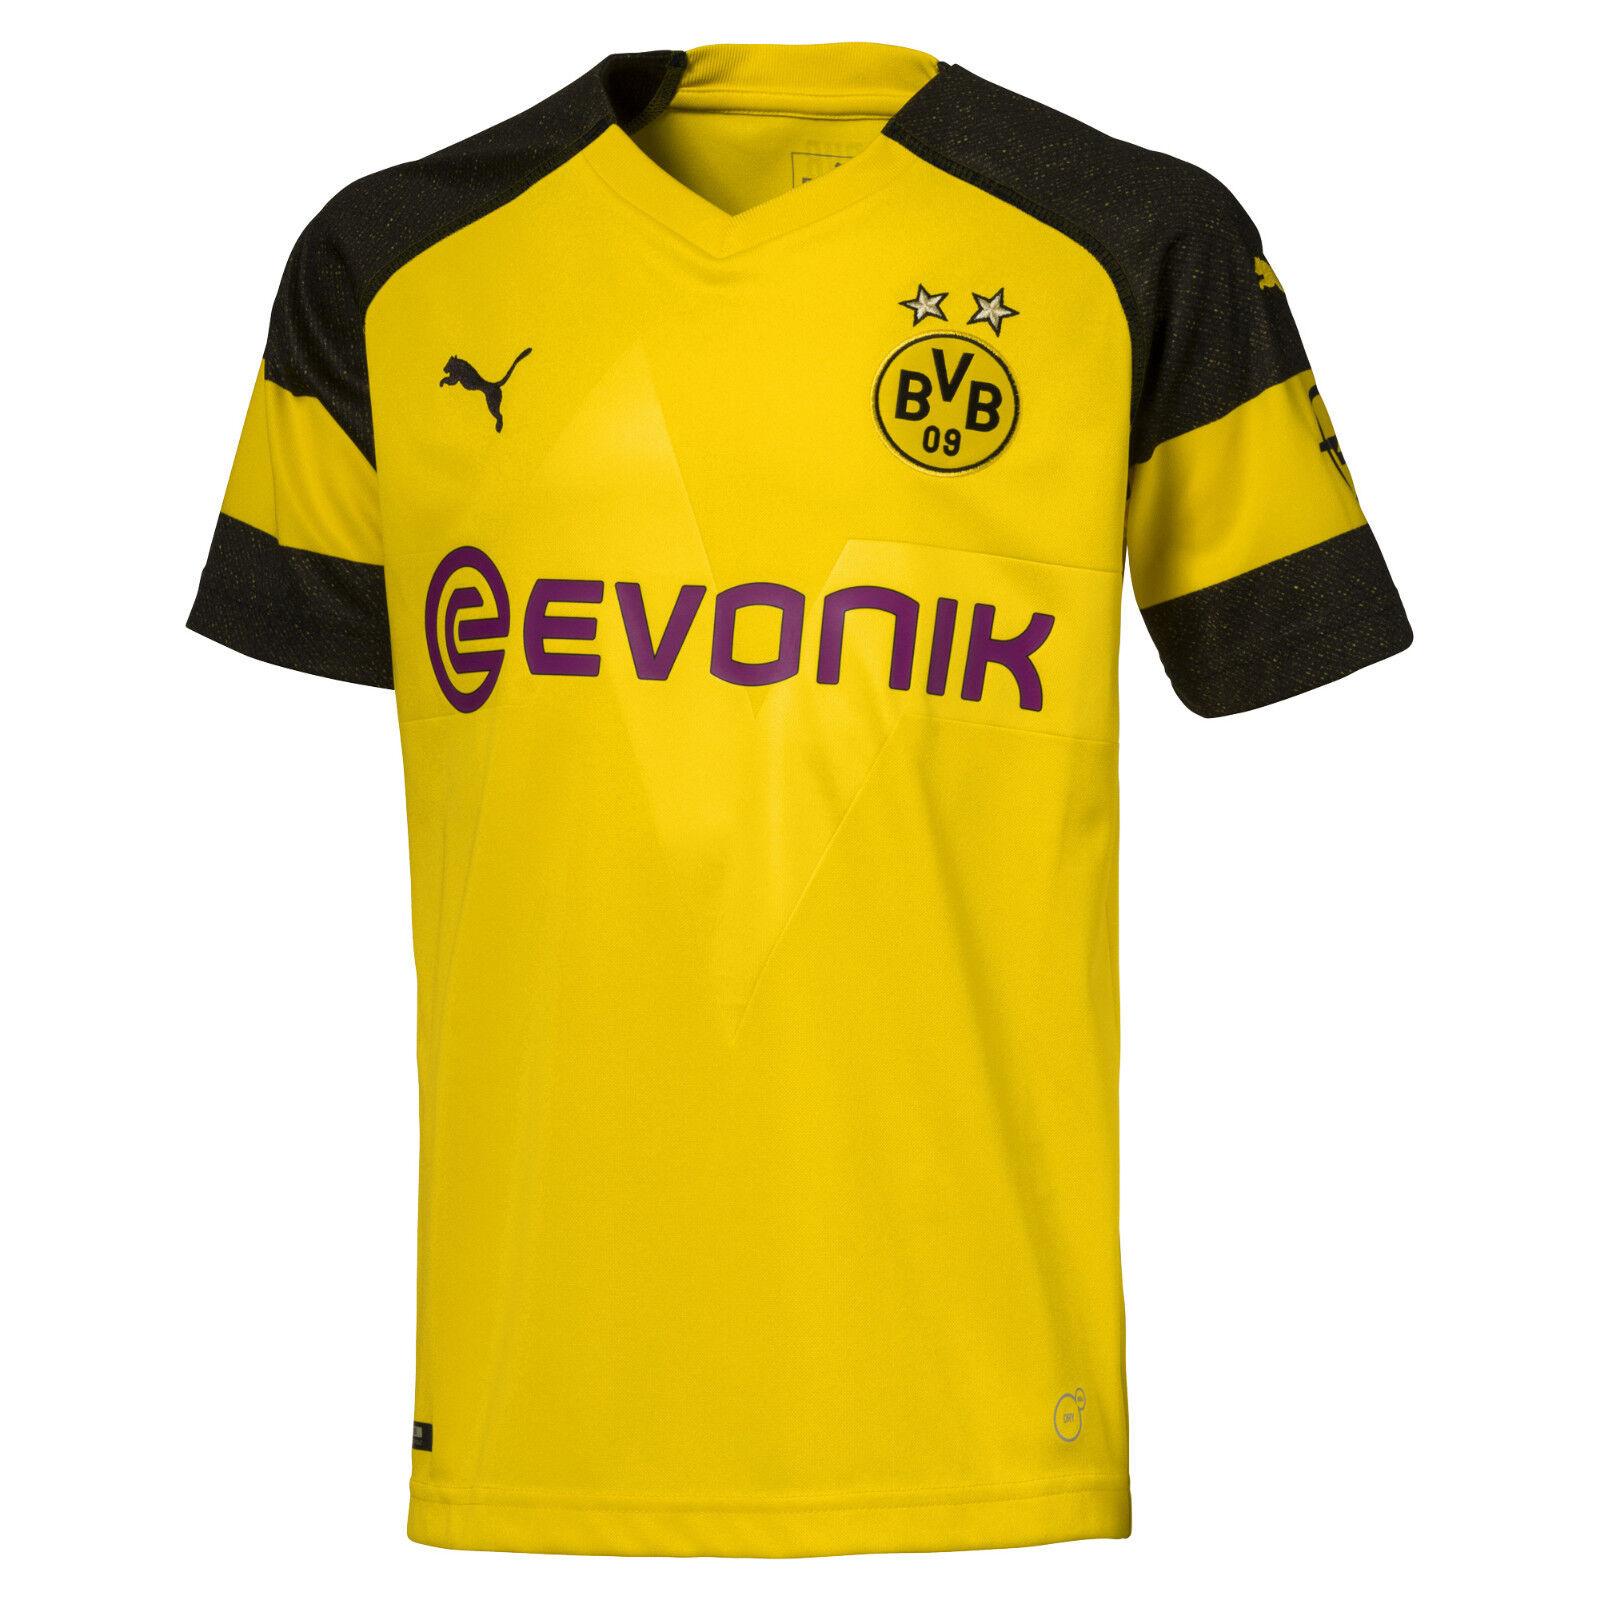 BVB Heim-Trikot Borussia Dortmund Heim Trikot Home Kids 18/19 PHILIPP Gr.140